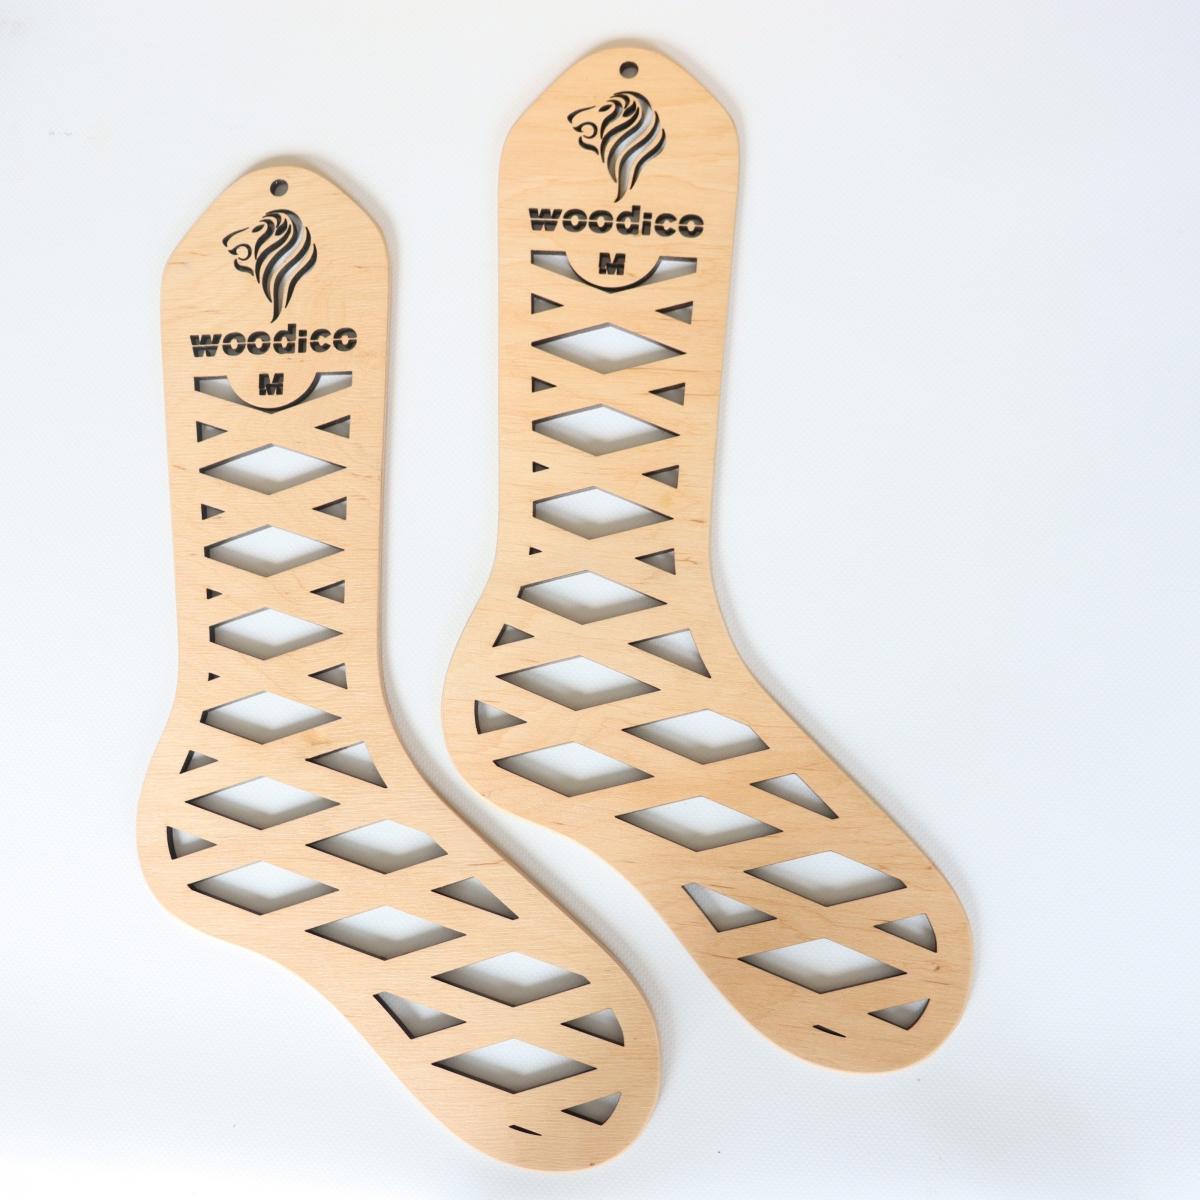 woodico.pro wooden sock blockers leo 17 1200x1200 - Wooden sock blockers / Leo